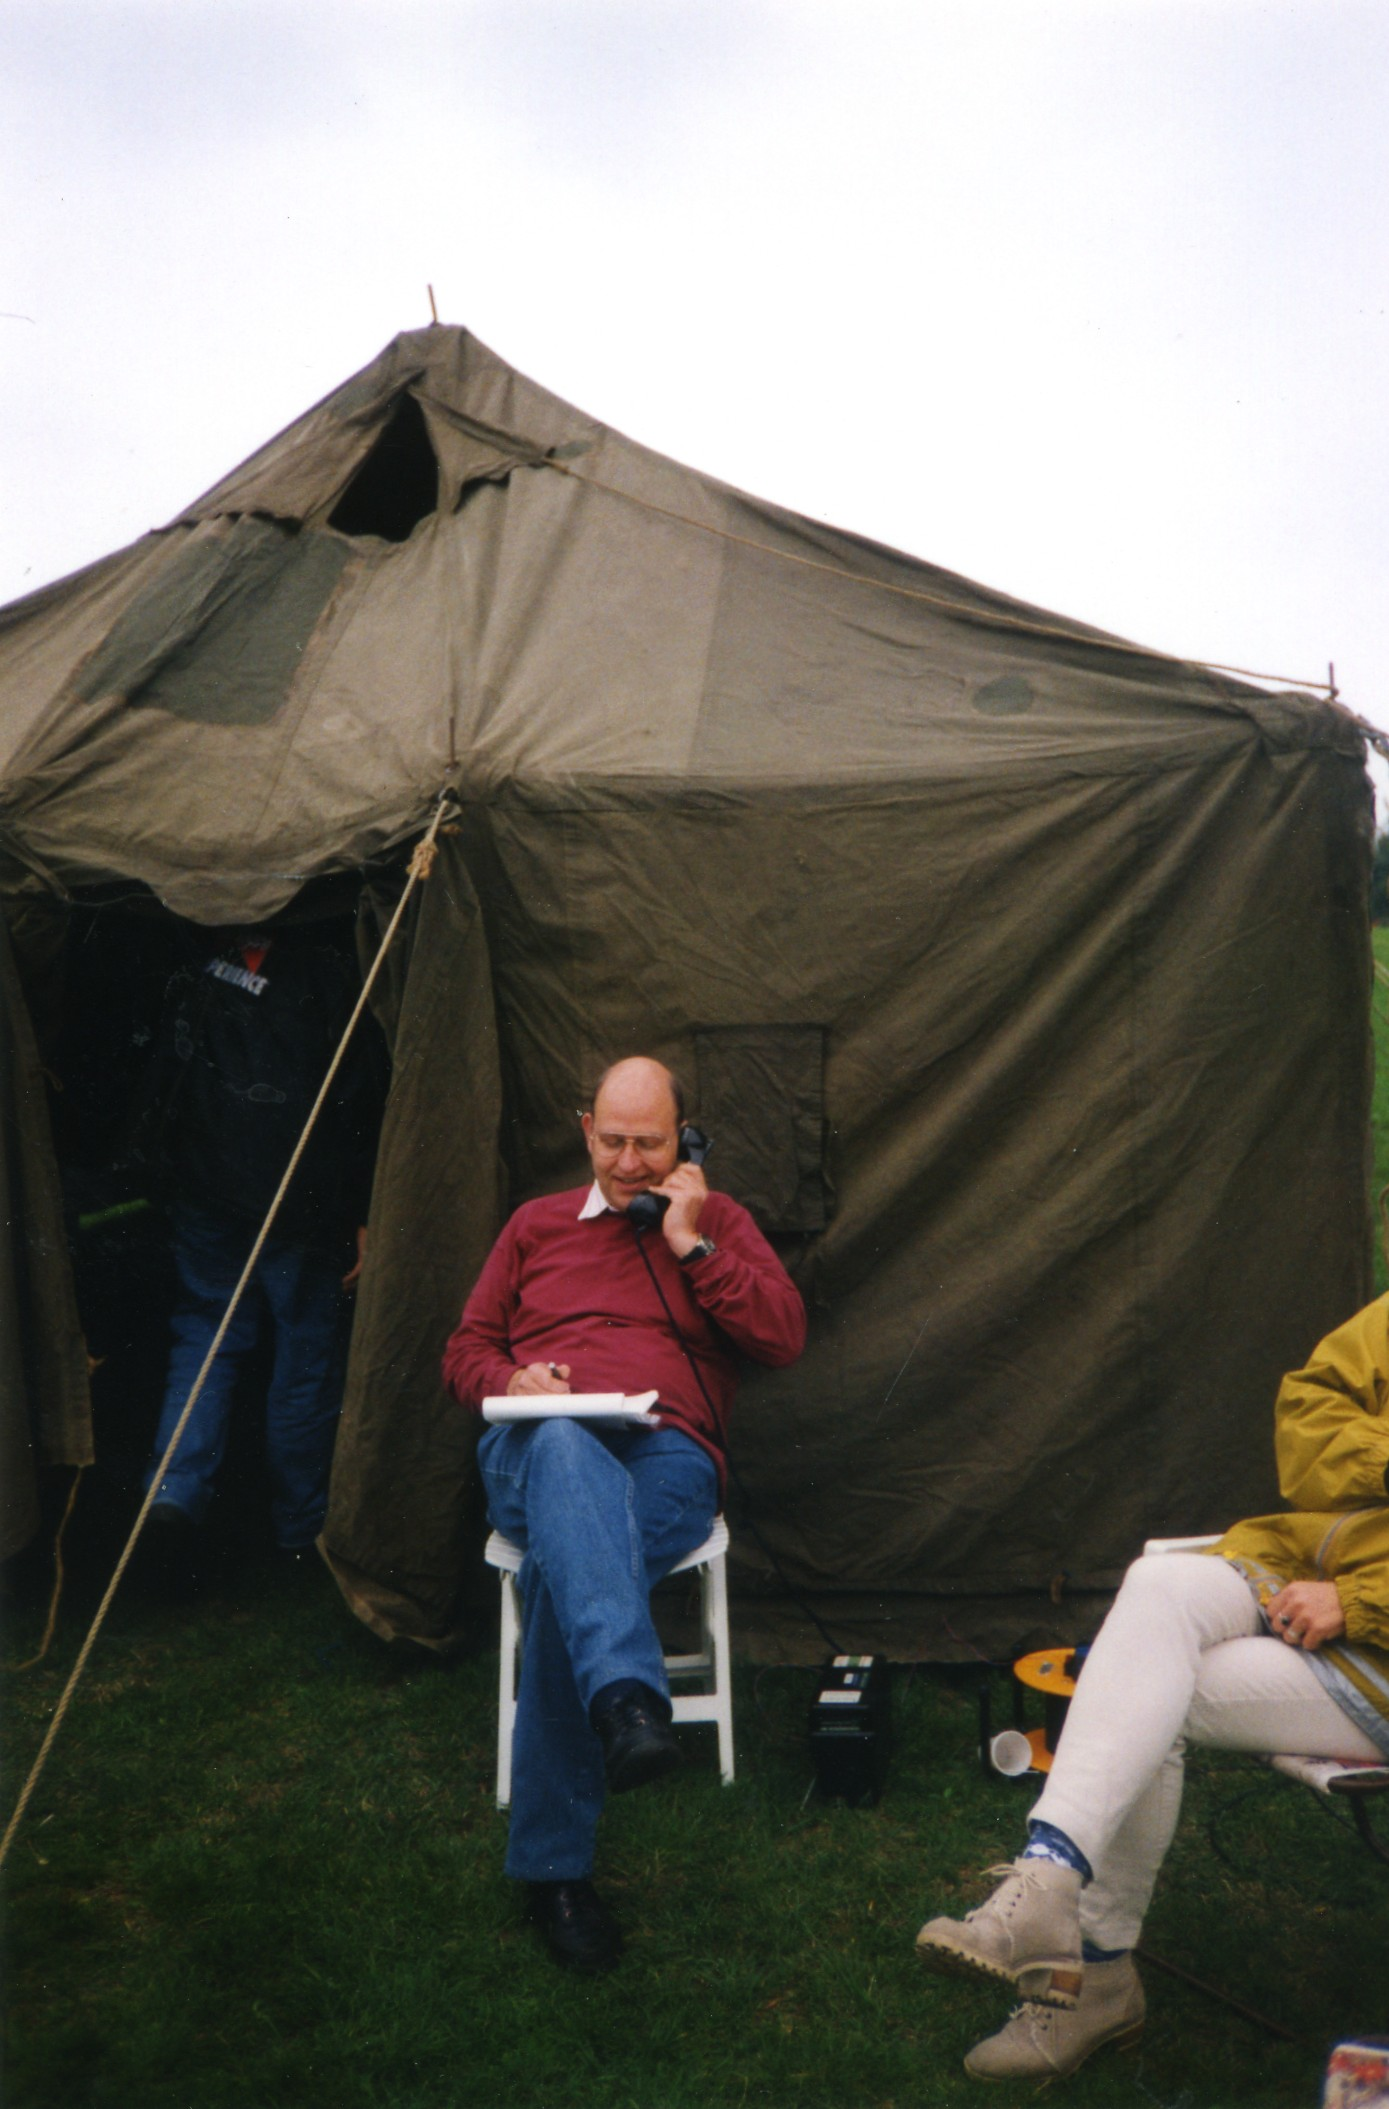 1997-10xx-Duikongevalssimulatie-Ggnan-Dipnoi-05